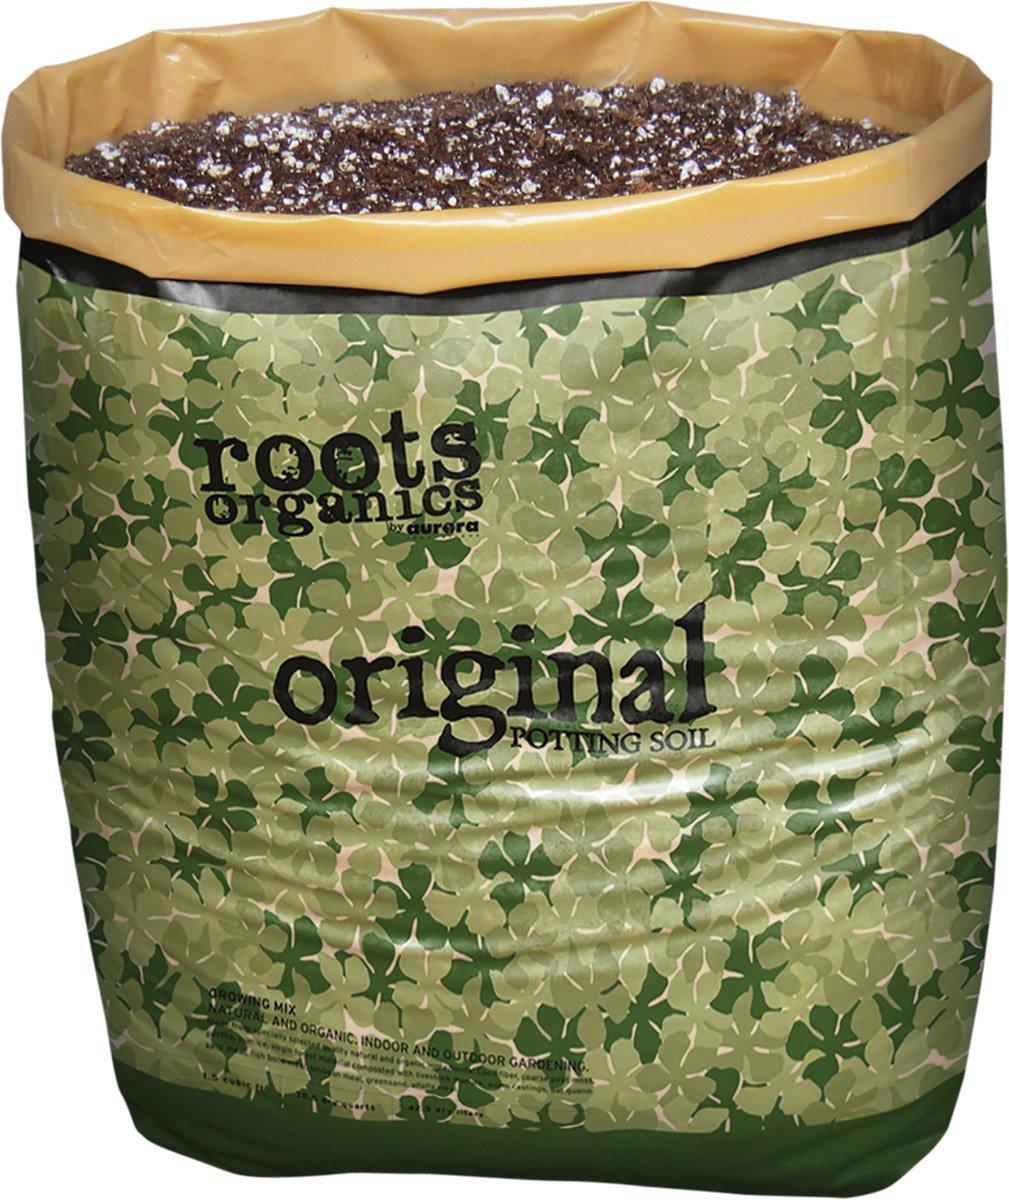 Roots Organics ROD75 Potting Soil.75 cu. ft.